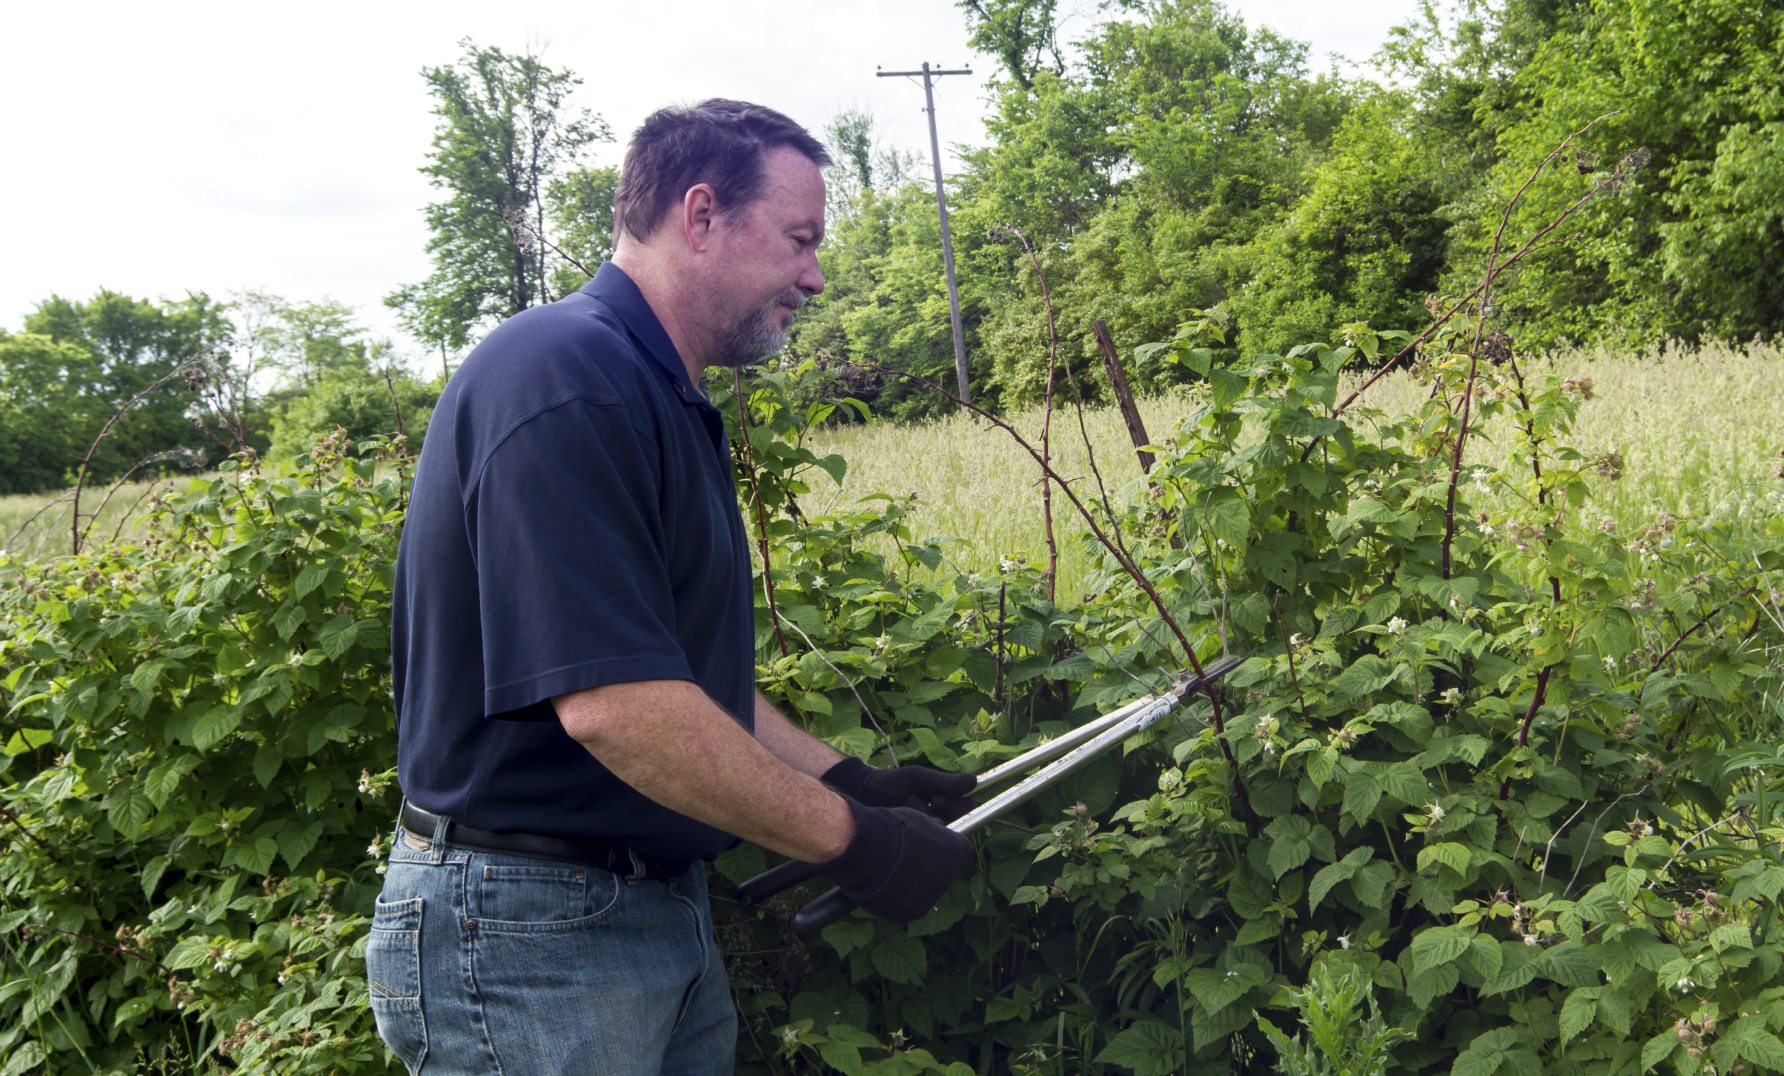 cutting back black raspberries  u2013 tips on pruning black